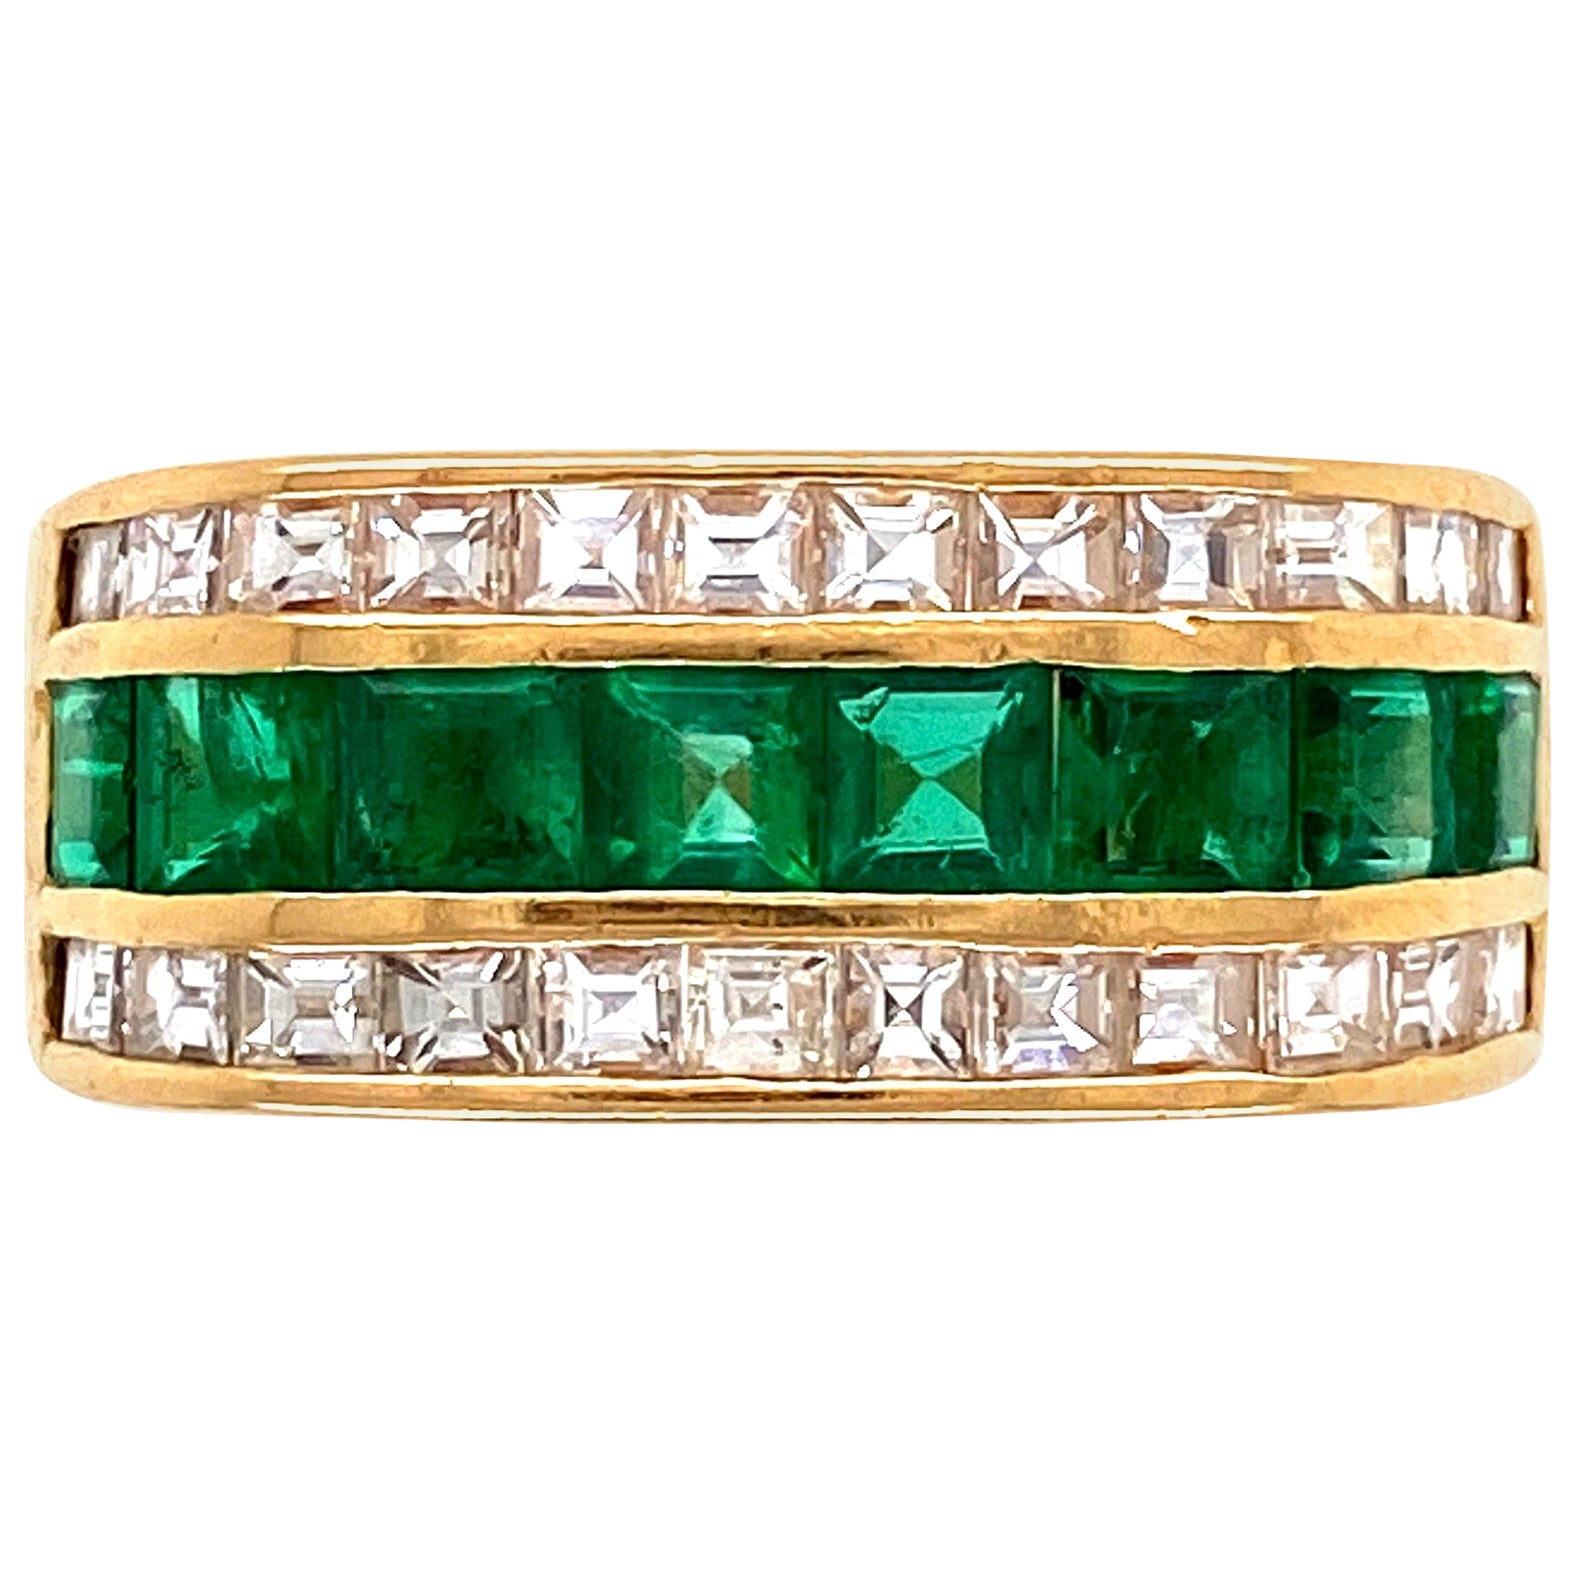 Muzo Emerald and Asscher Cut Diamond Gold Band Cocktail Ring Estate Fine Jewelry